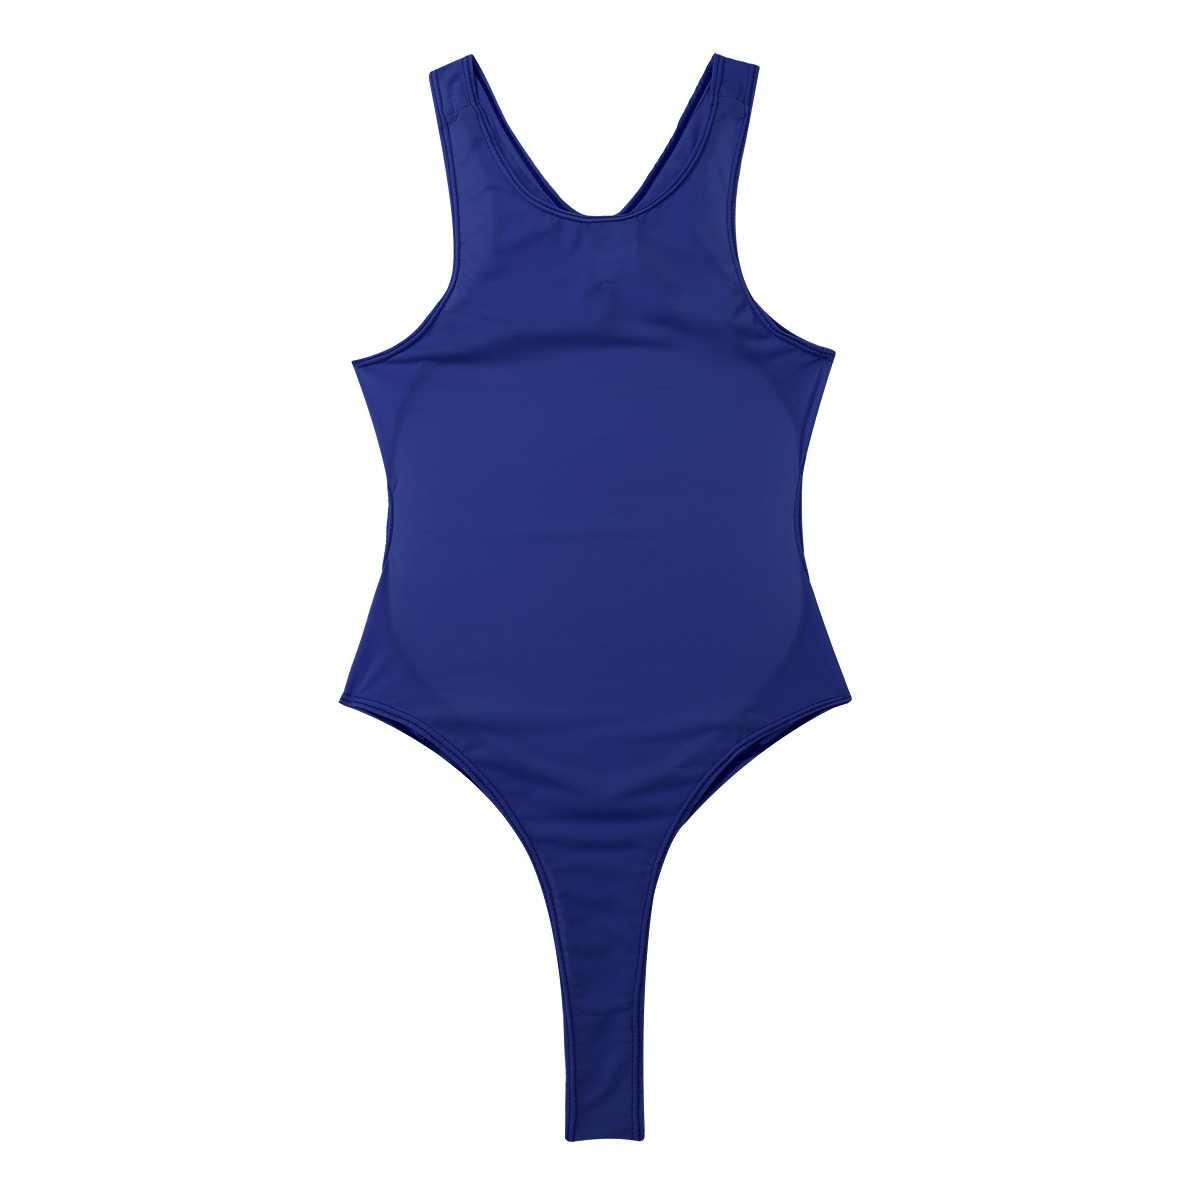 TiaoBug Volwassen Mouwloze Een stuk See Through Sheer Ondergoed Badpak Hoge Cut Backless Badmode Turnpakje Vrouwen Sexy Bodysuit